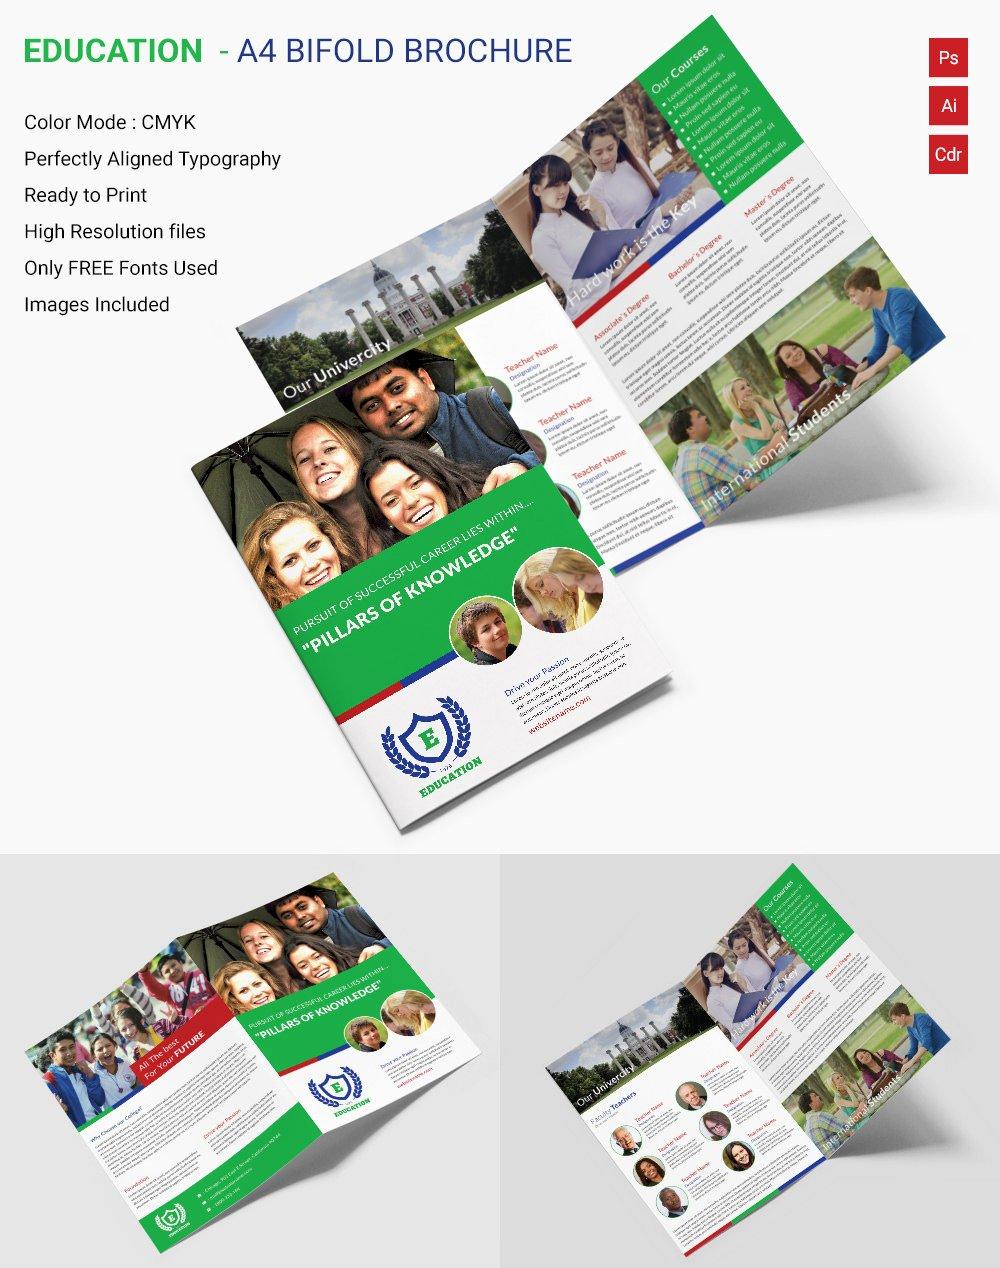 School Brochure Template Free Inspirational Education Brochure Template 43 Free Psd Eps Indesign